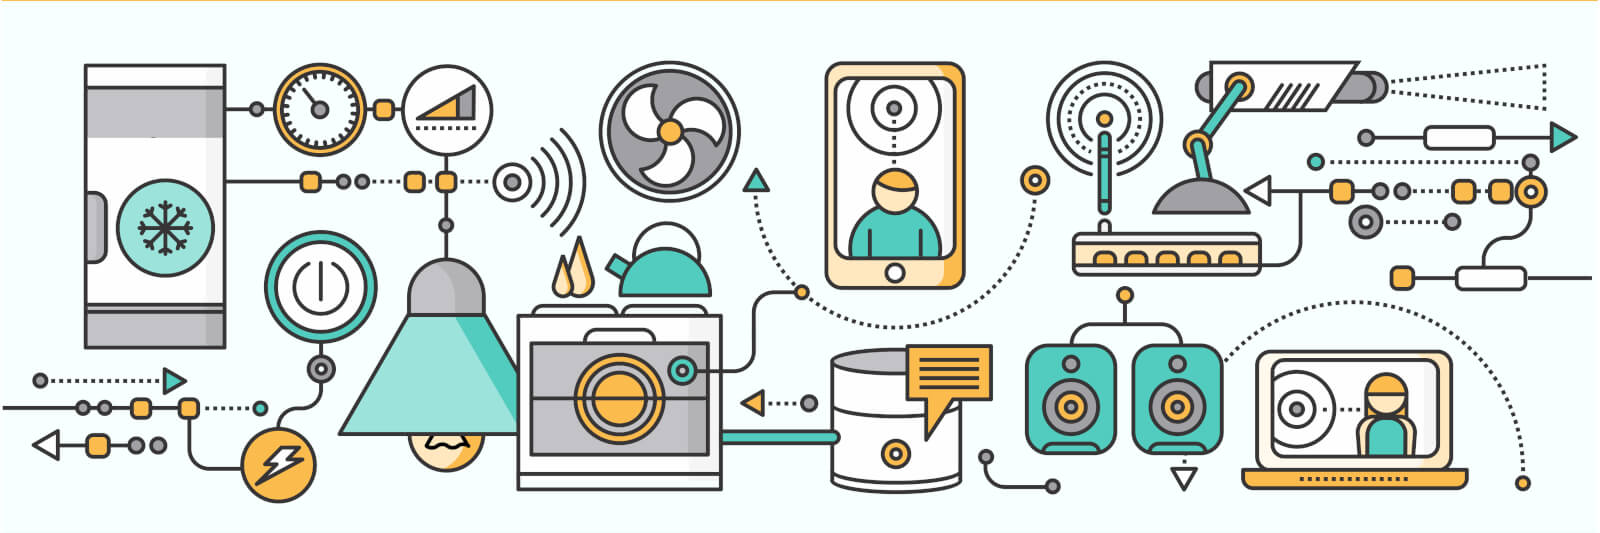 blockchain, Internet of Things